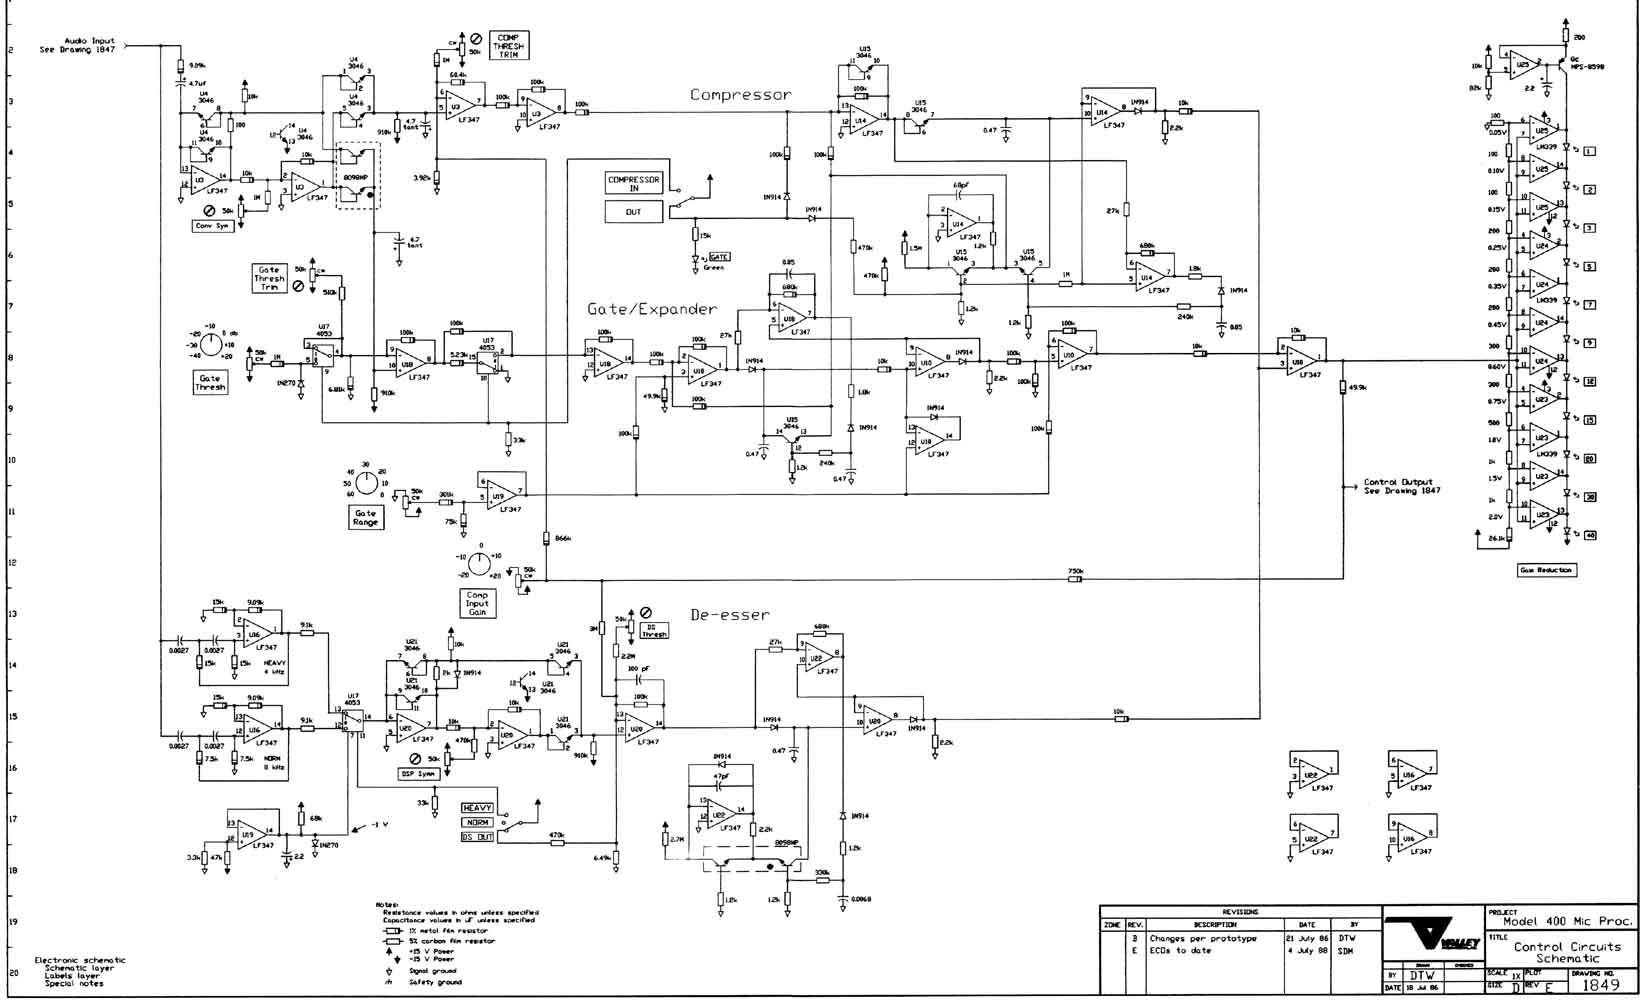 valley 400 mic processor schematic